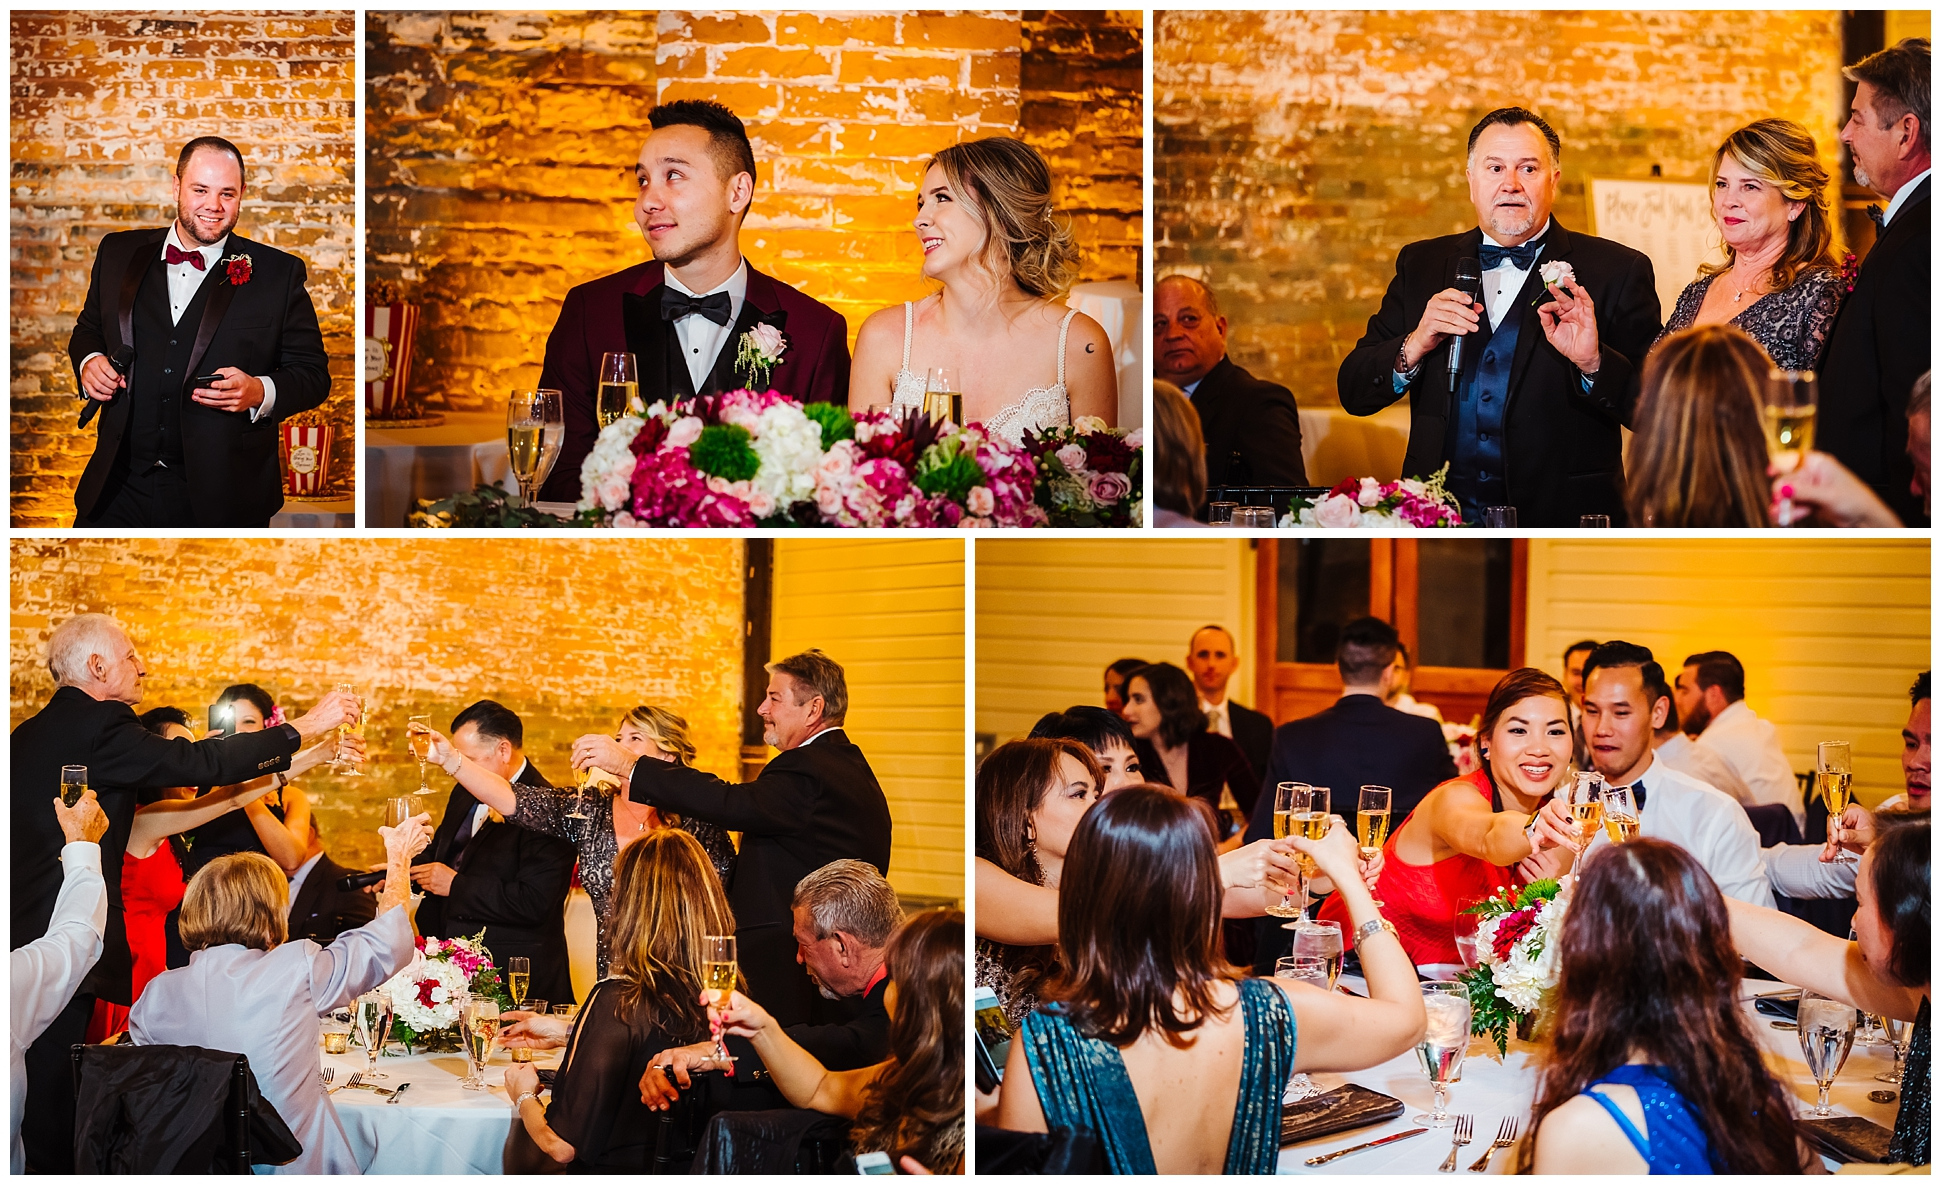 tampa-armeture-wedding-photographer-edgy-industrial-downtown-fancy-free-nursery-tattoo-burgandy-velvet_0077.jpg